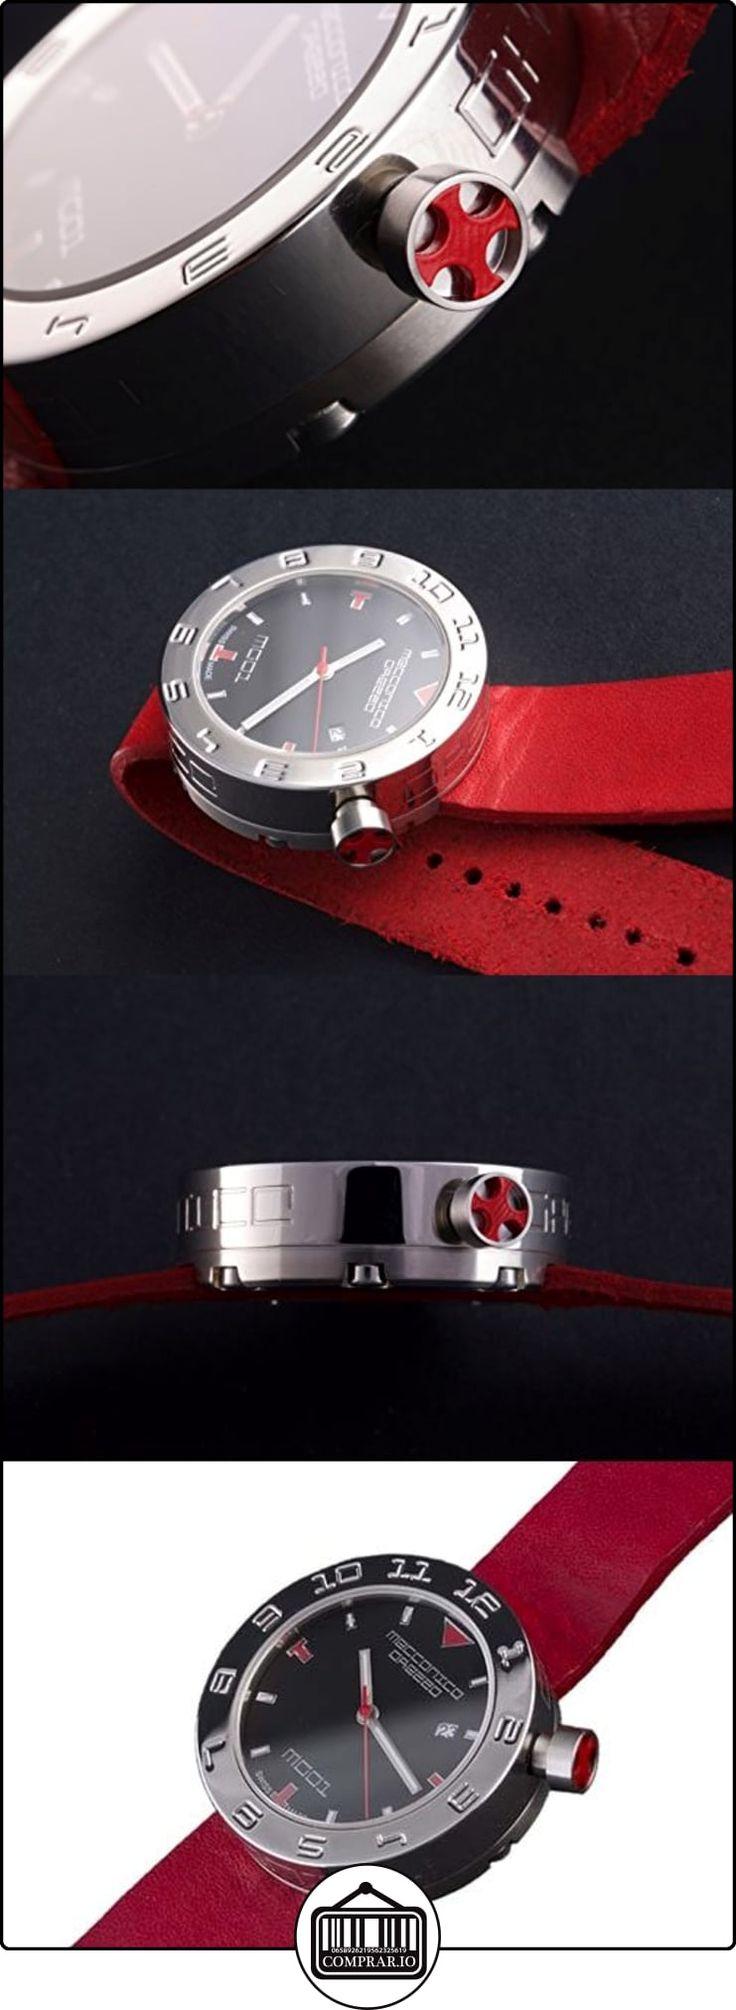 Reloj - Meccanica Grezza di Flavio Oreda - Para  - Cinturino RD 38 de  ✿ Relojes para hombre - (Lujo) ✿